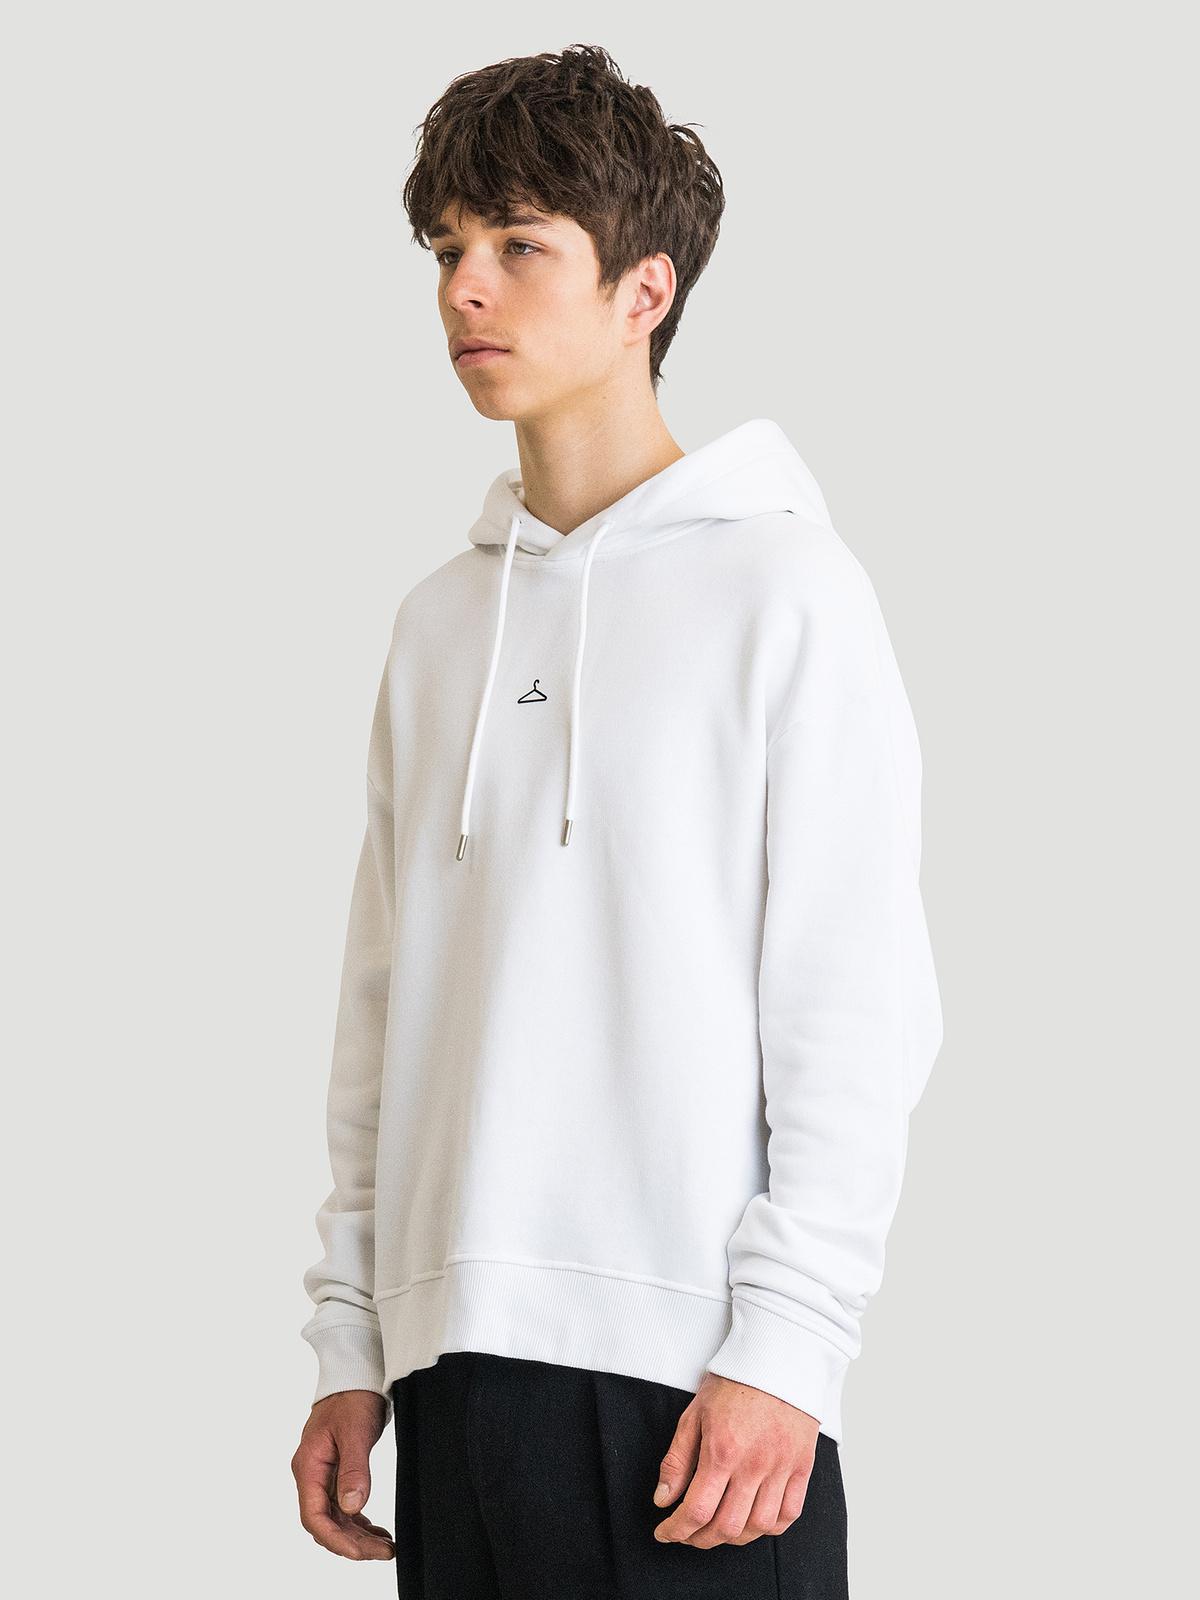 Hanger Hoodie White 6